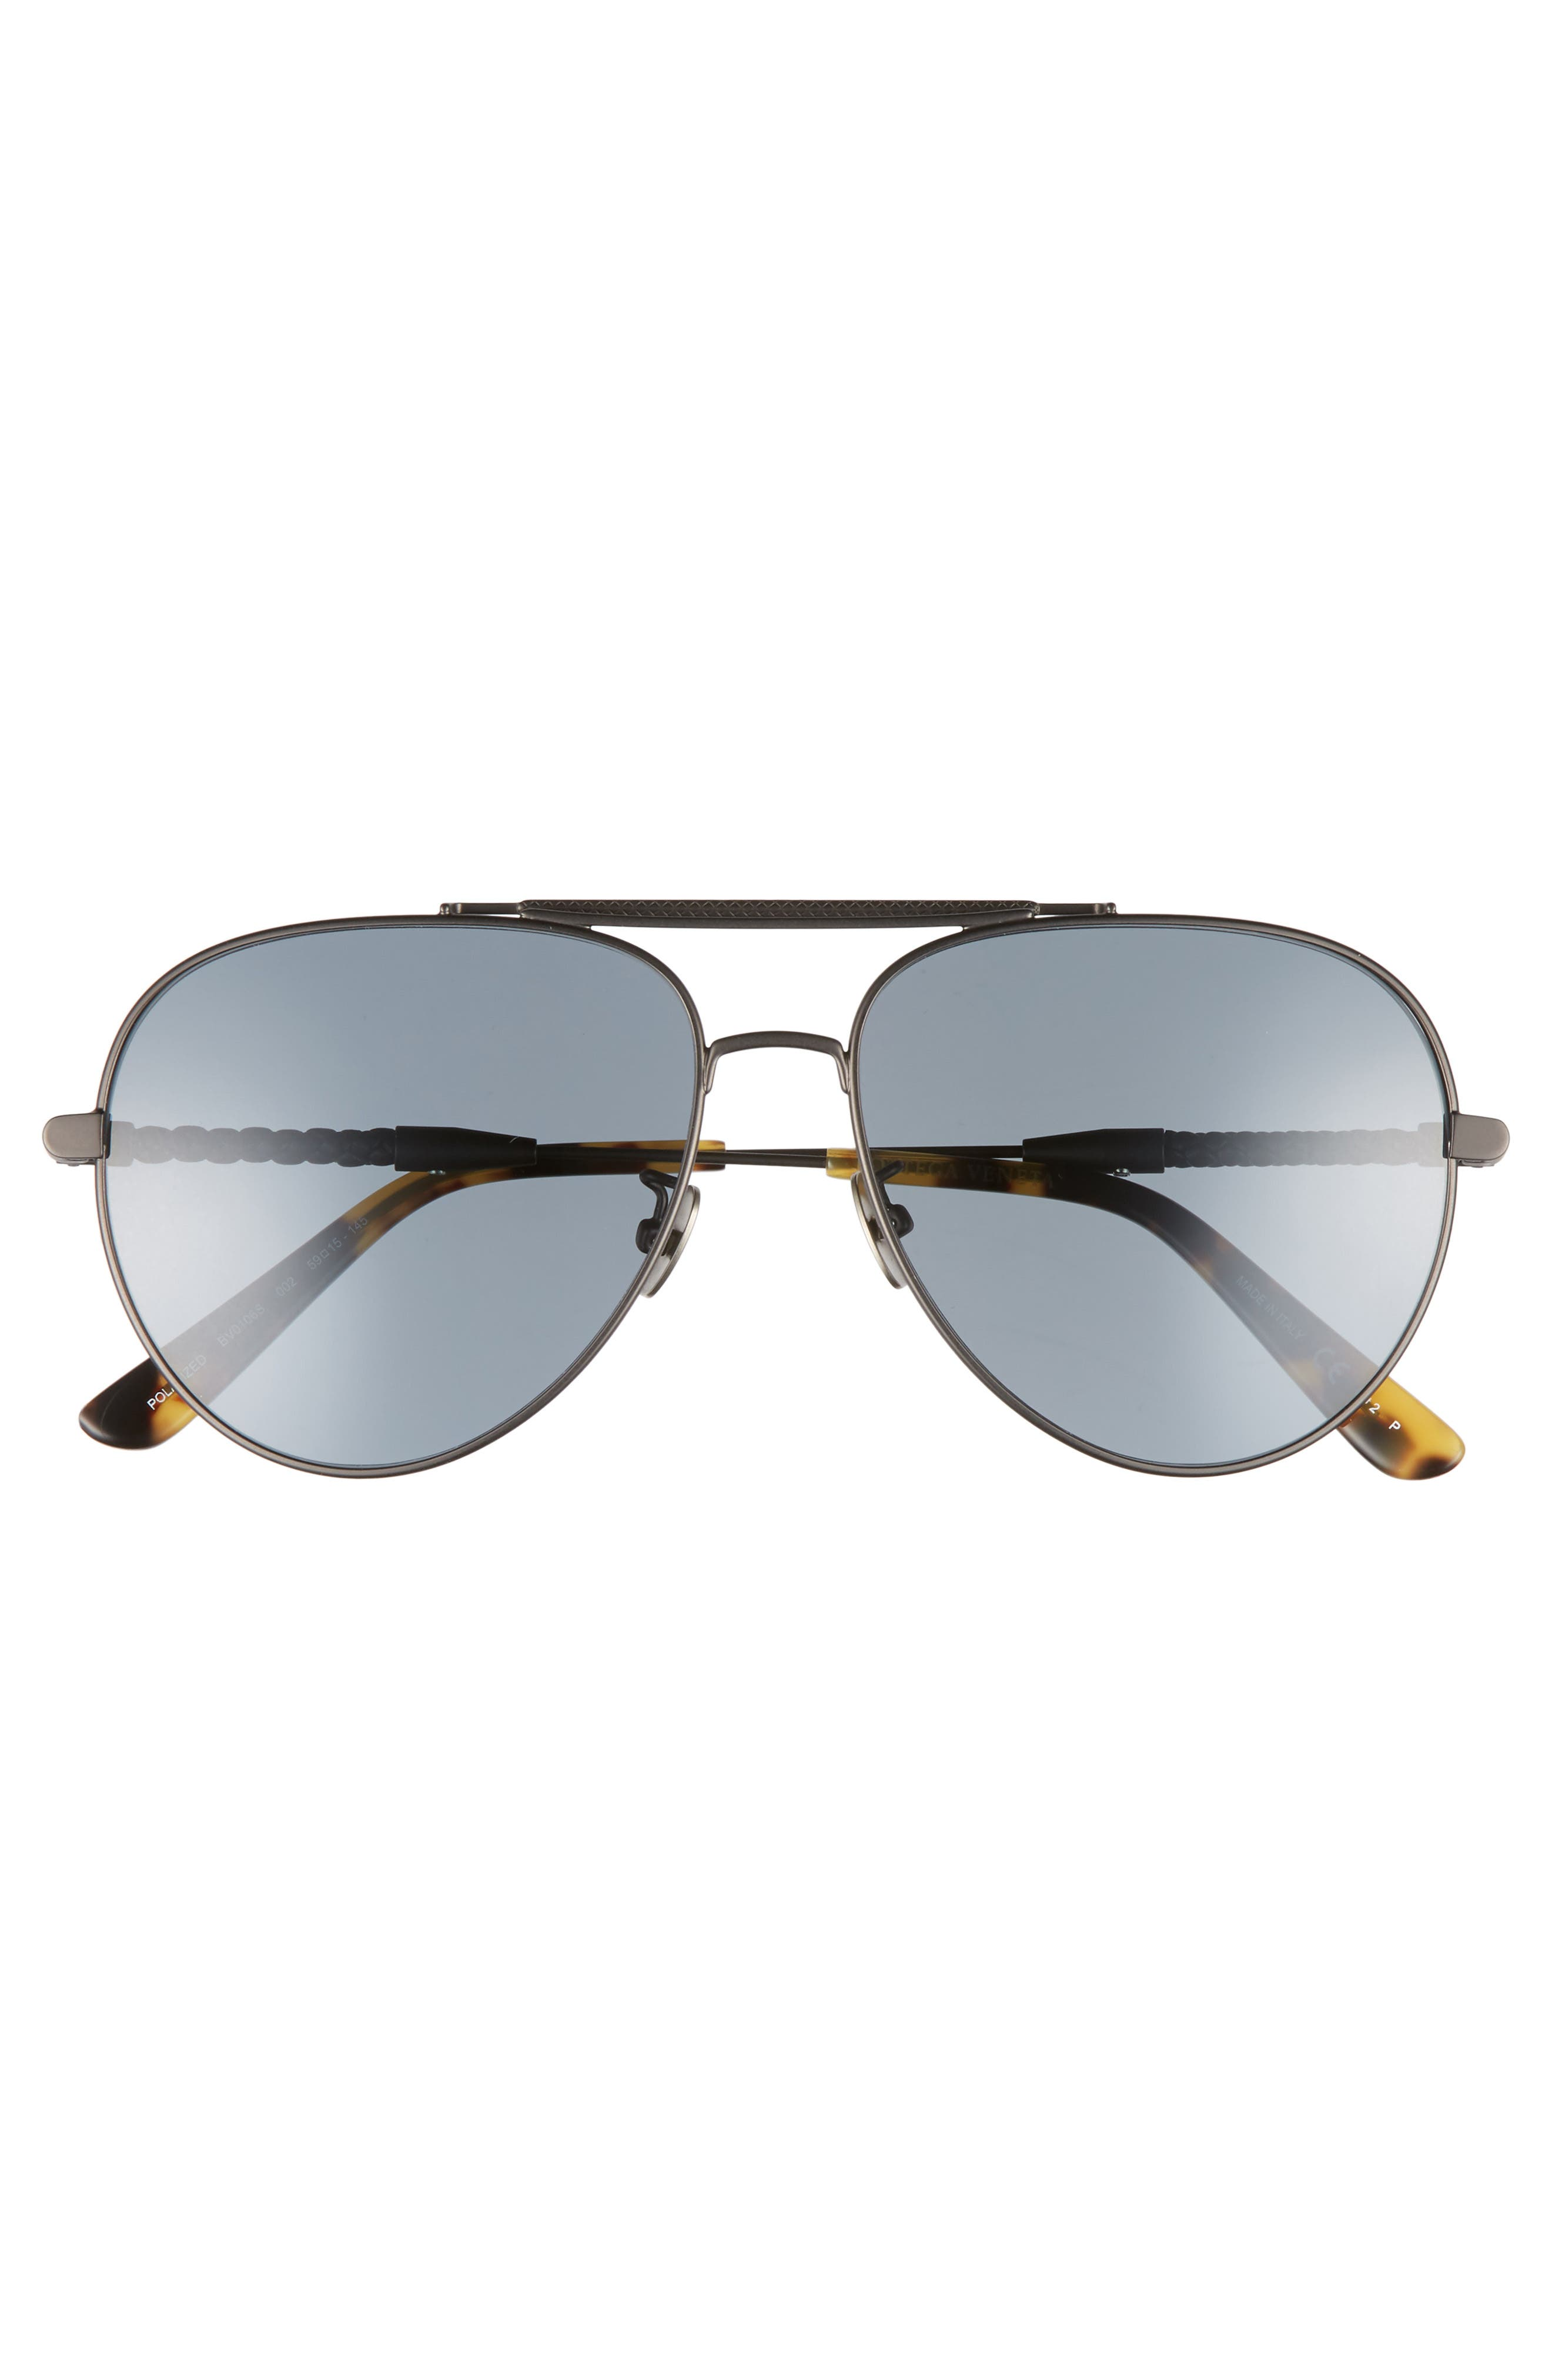 59m Polarized Aviator Sunglasses,                             Alternate thumbnail 3, color,